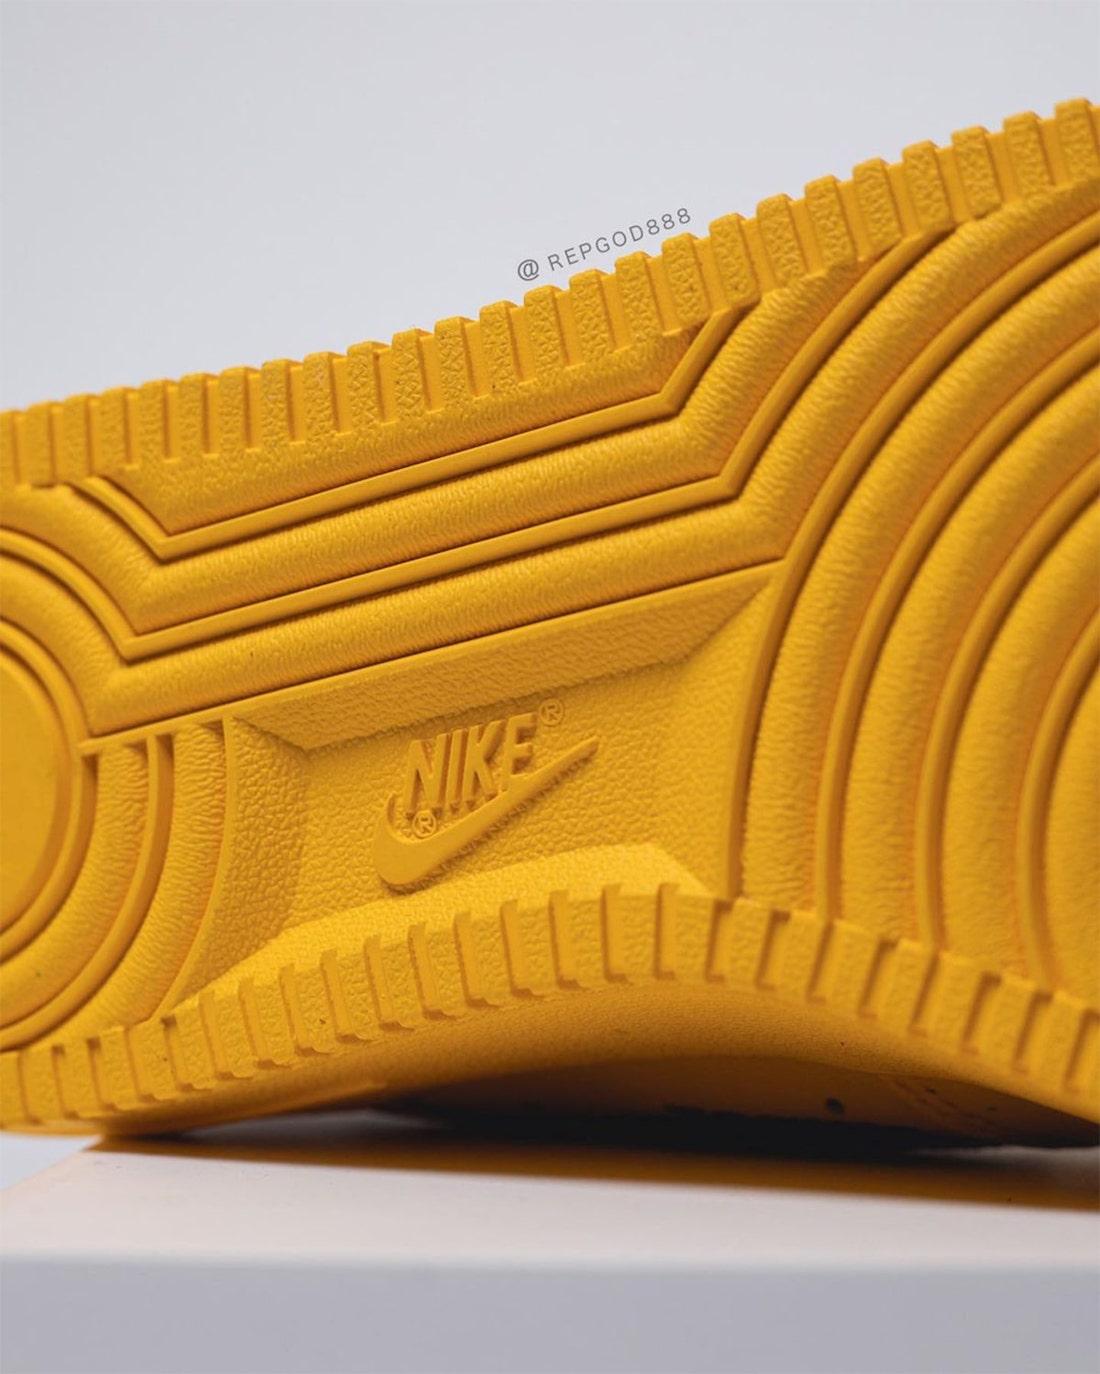 OFF-WHITE,Nike,Air Force 1,DD1  又是超限量会展限定?全新 OFF-WHITE x AF1 实物照曝光!